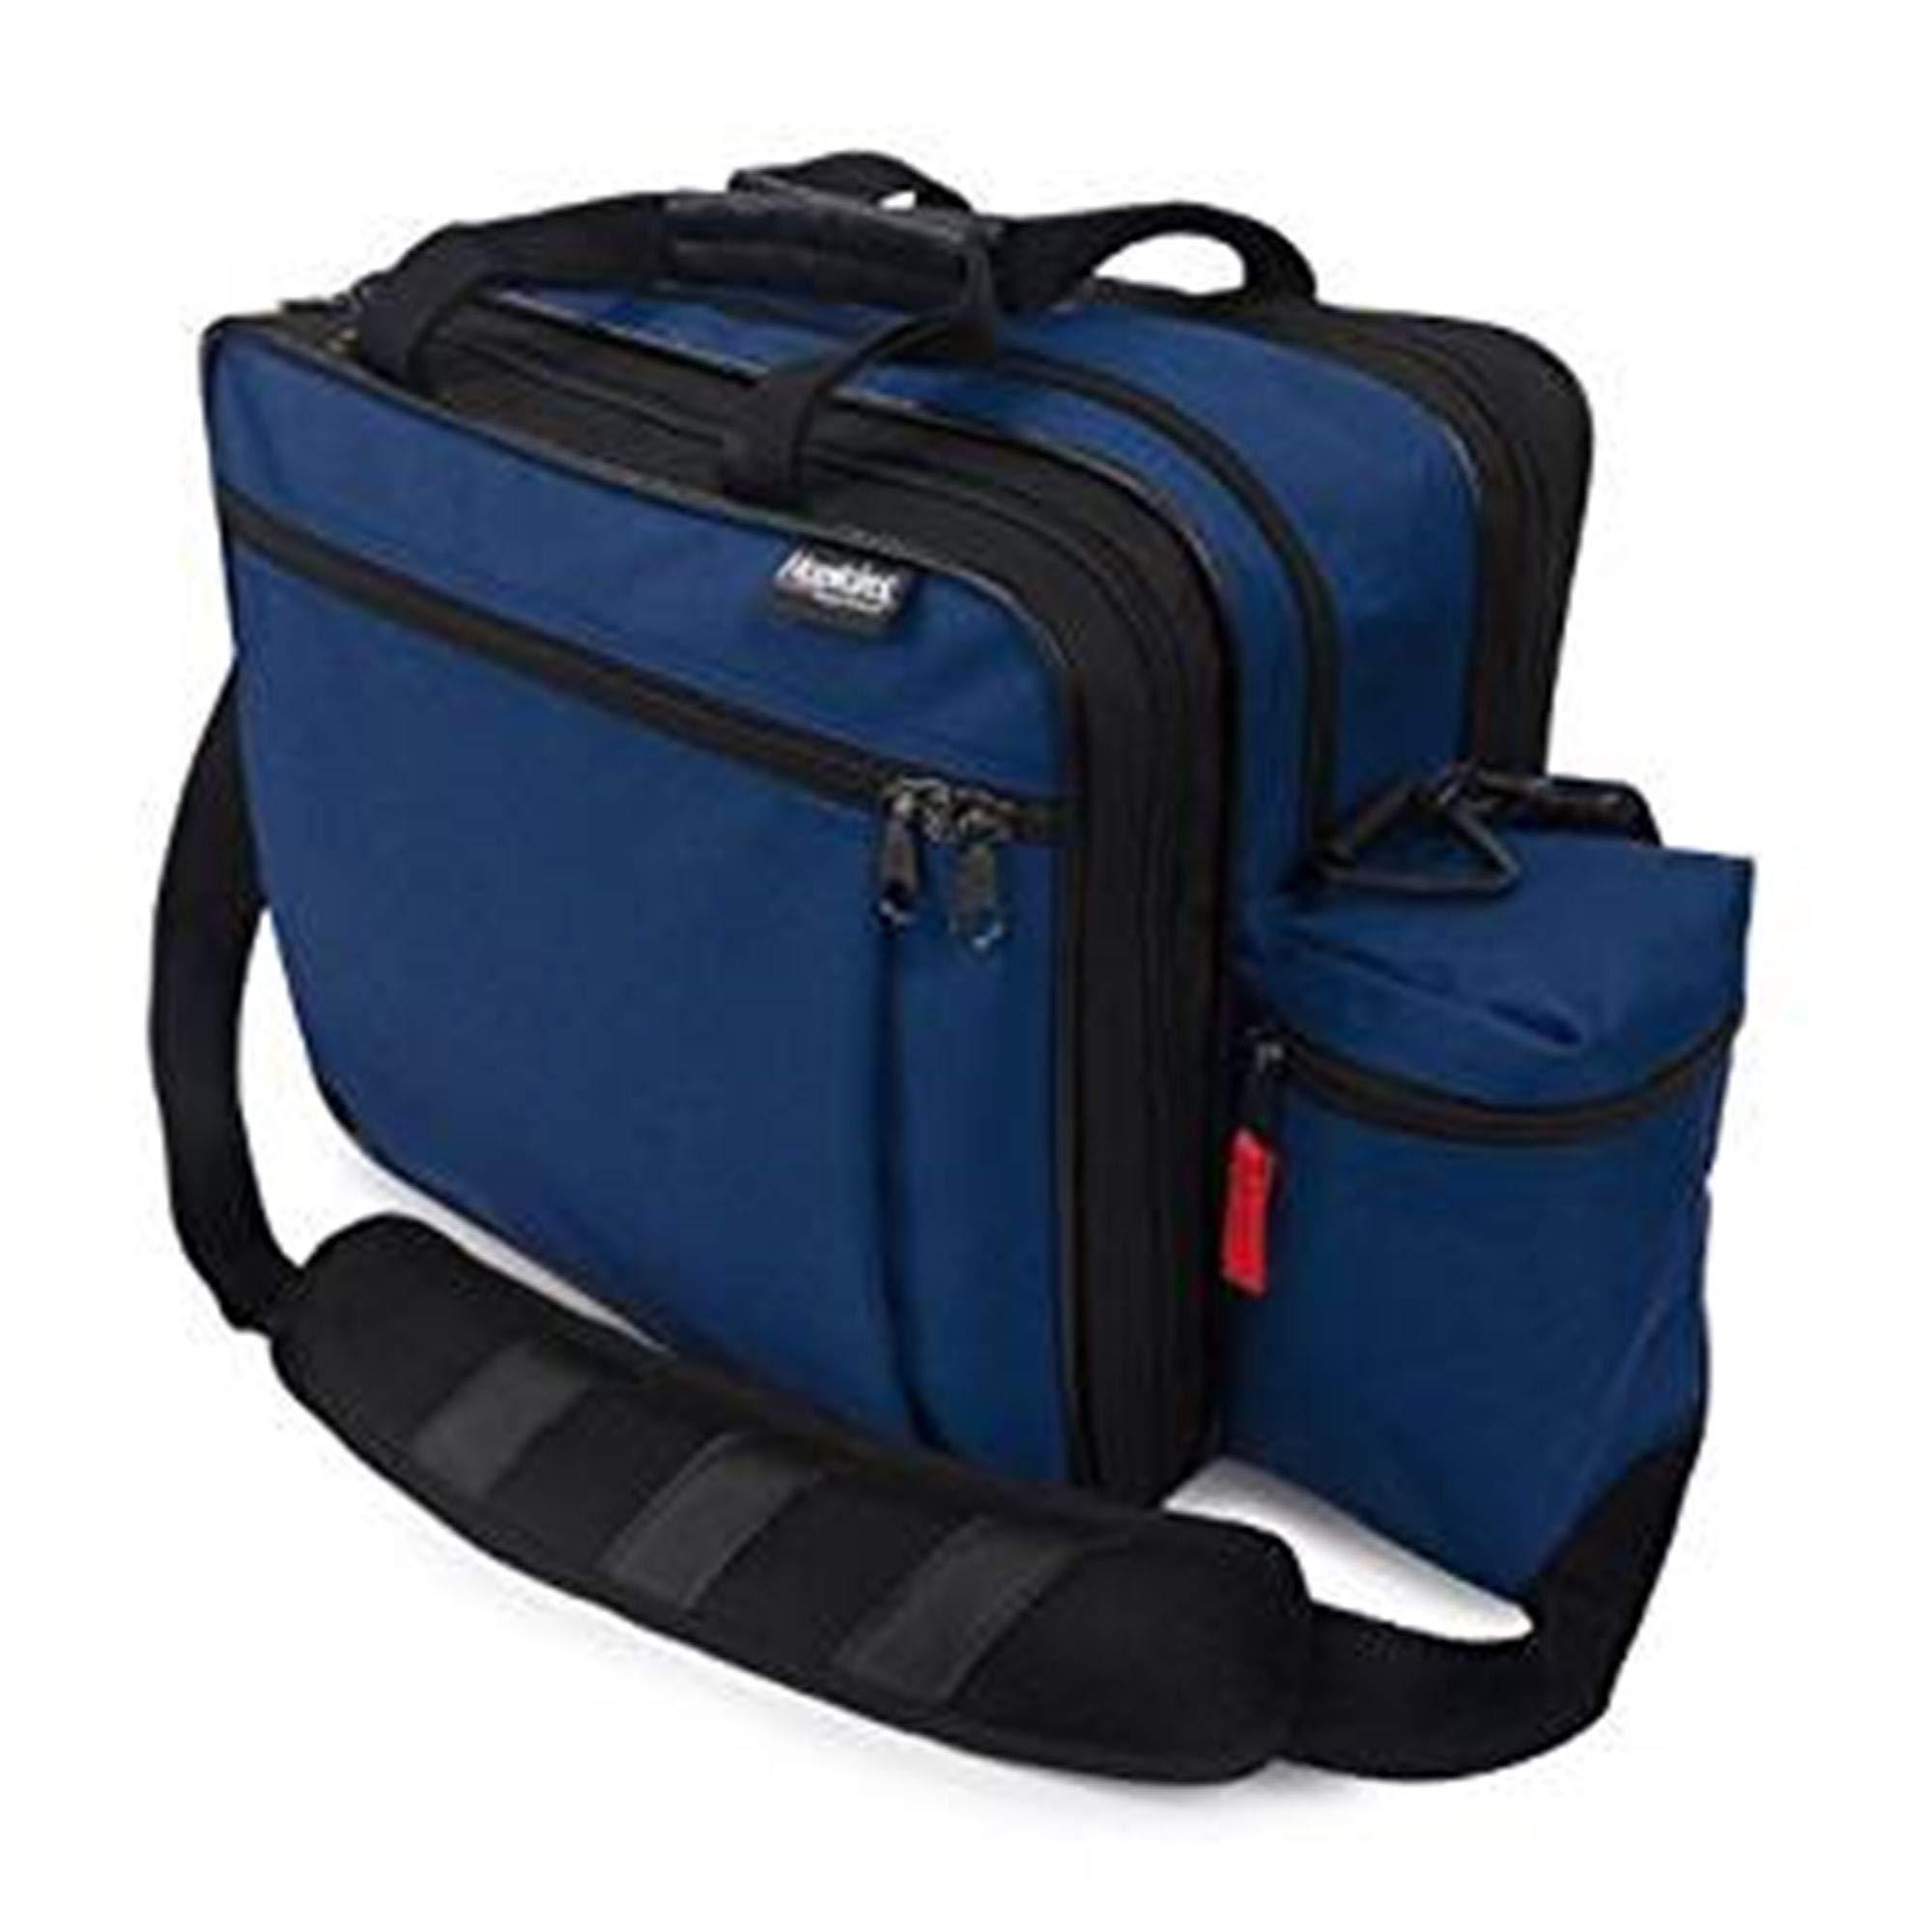 Hopkins Medical EZ View Med Bag - Navy Blue by Hopkins Medical Products